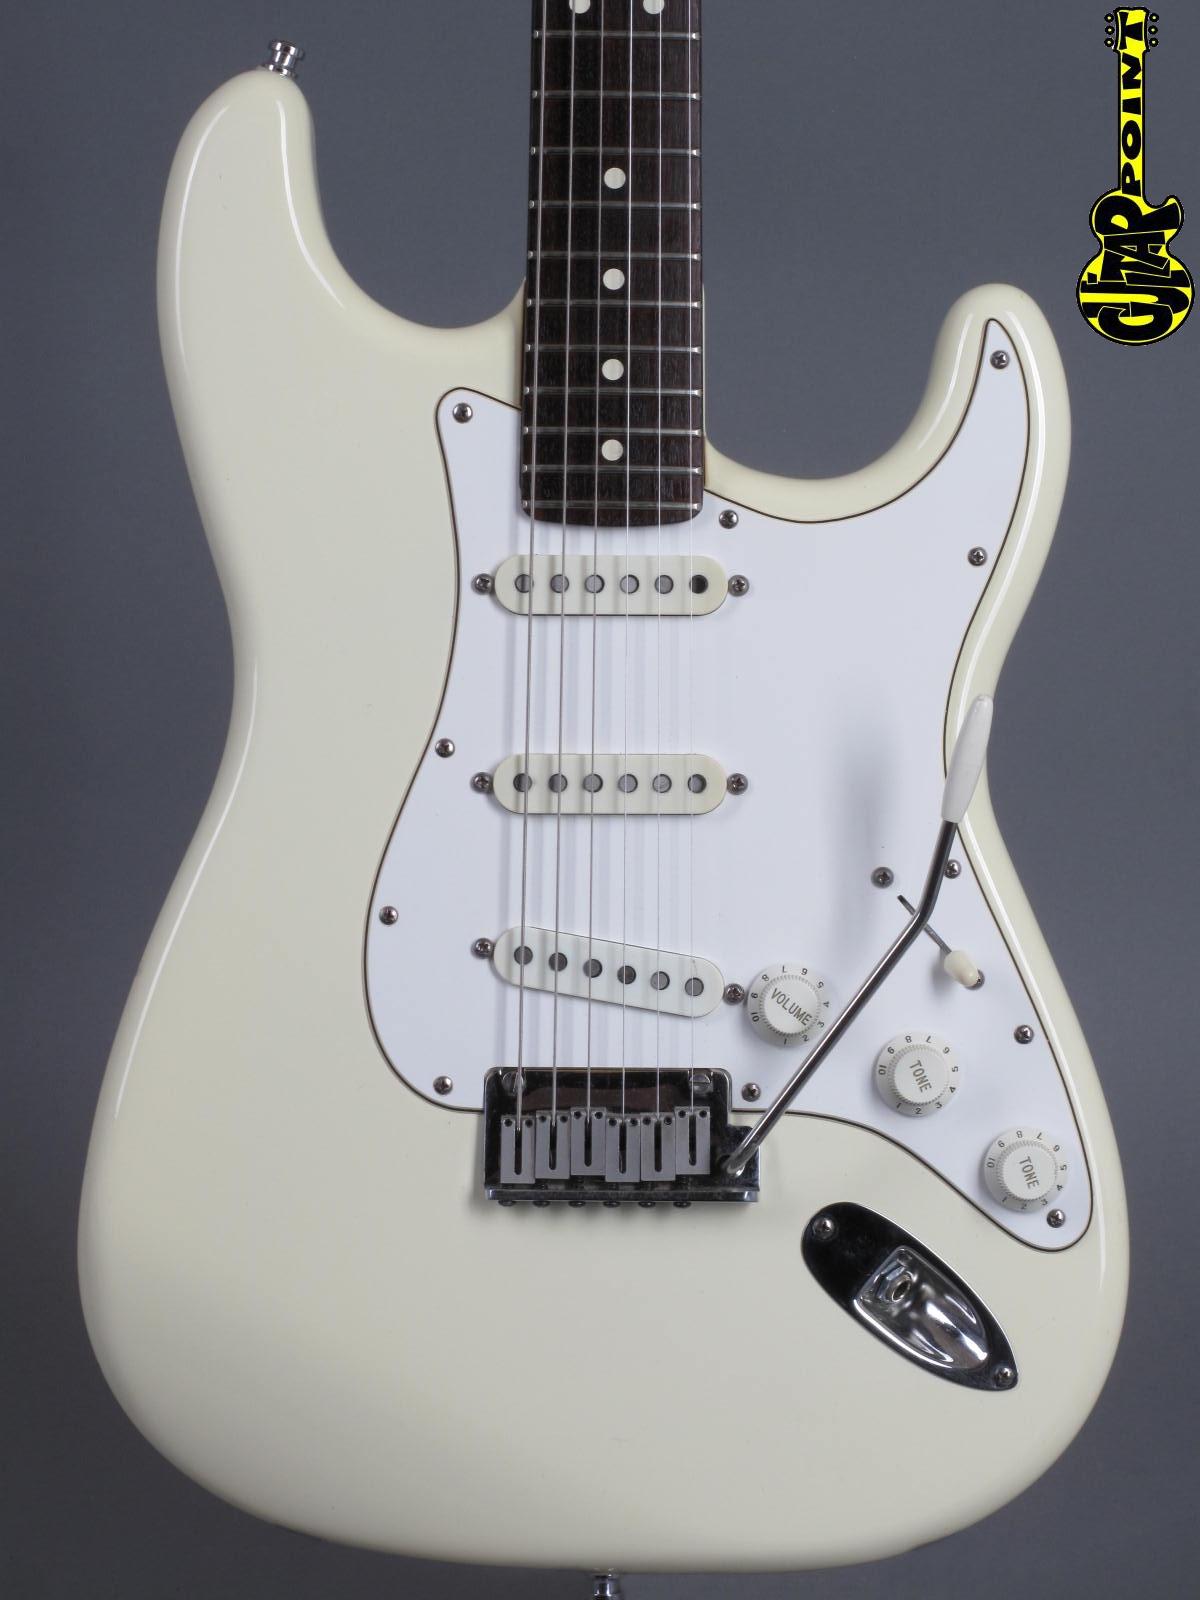 1988 Fender American Standard Stratocaster - Olympic White